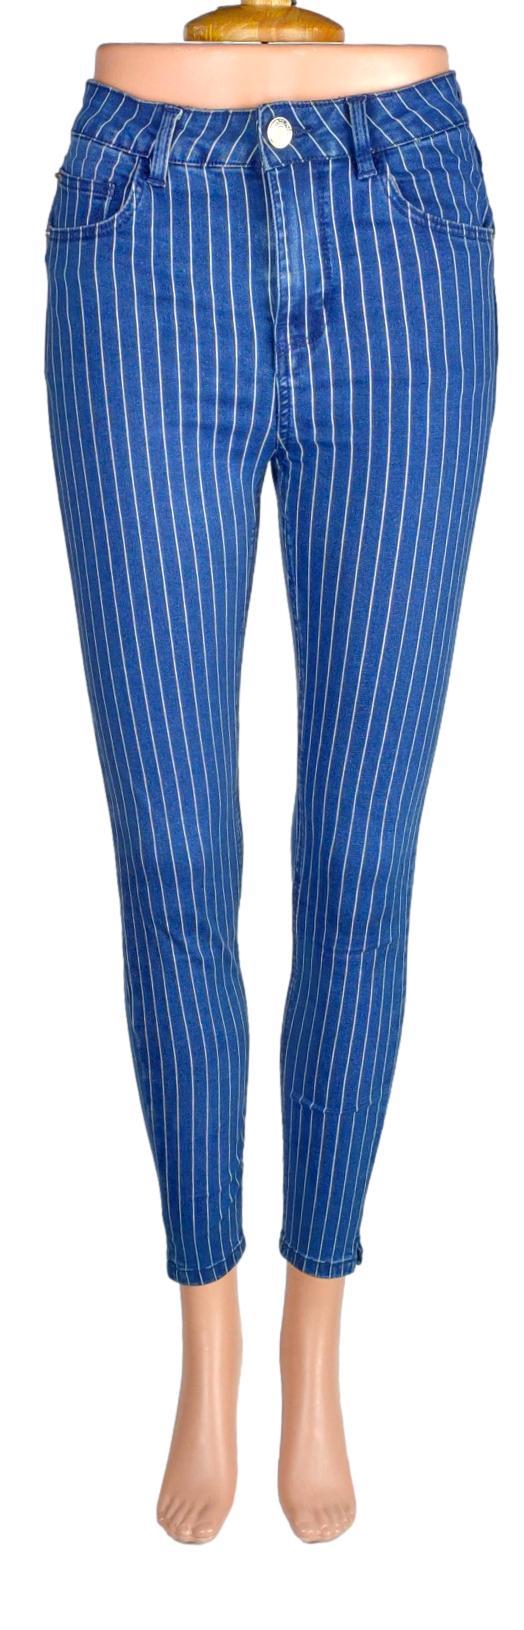 Pantalon Denim & Co - Taille 36